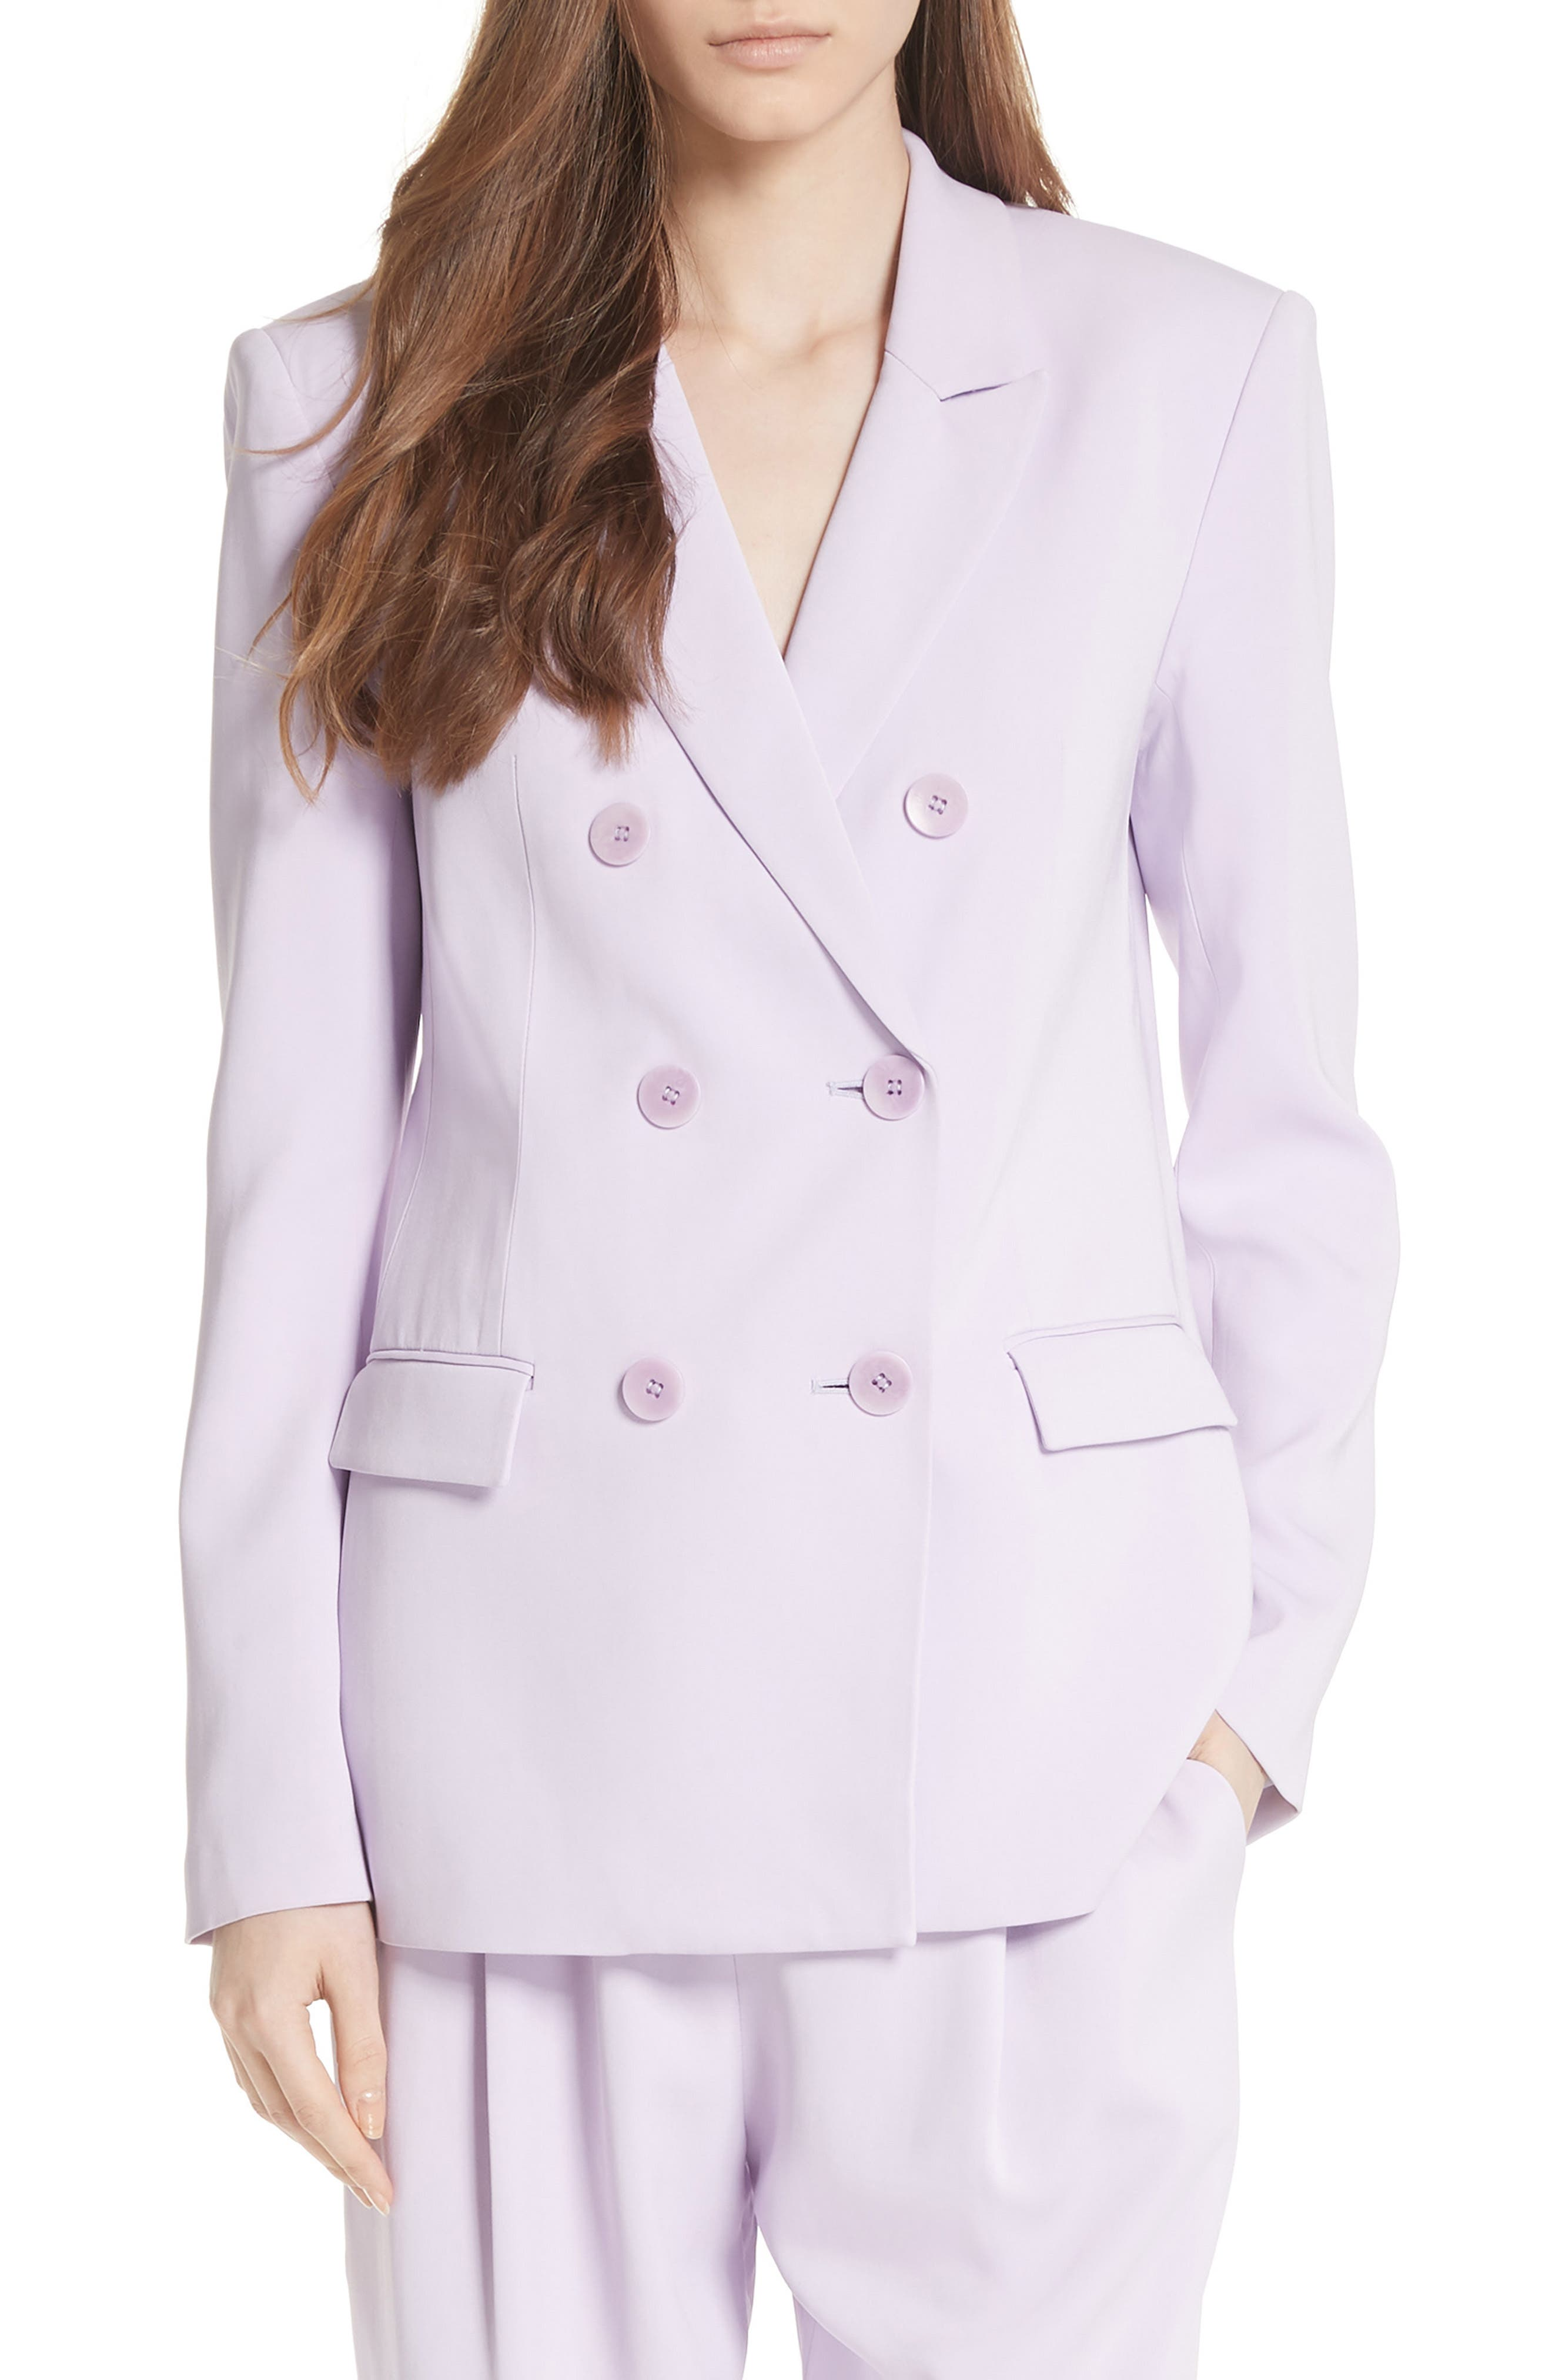 Tibi Steward Suit Jacket